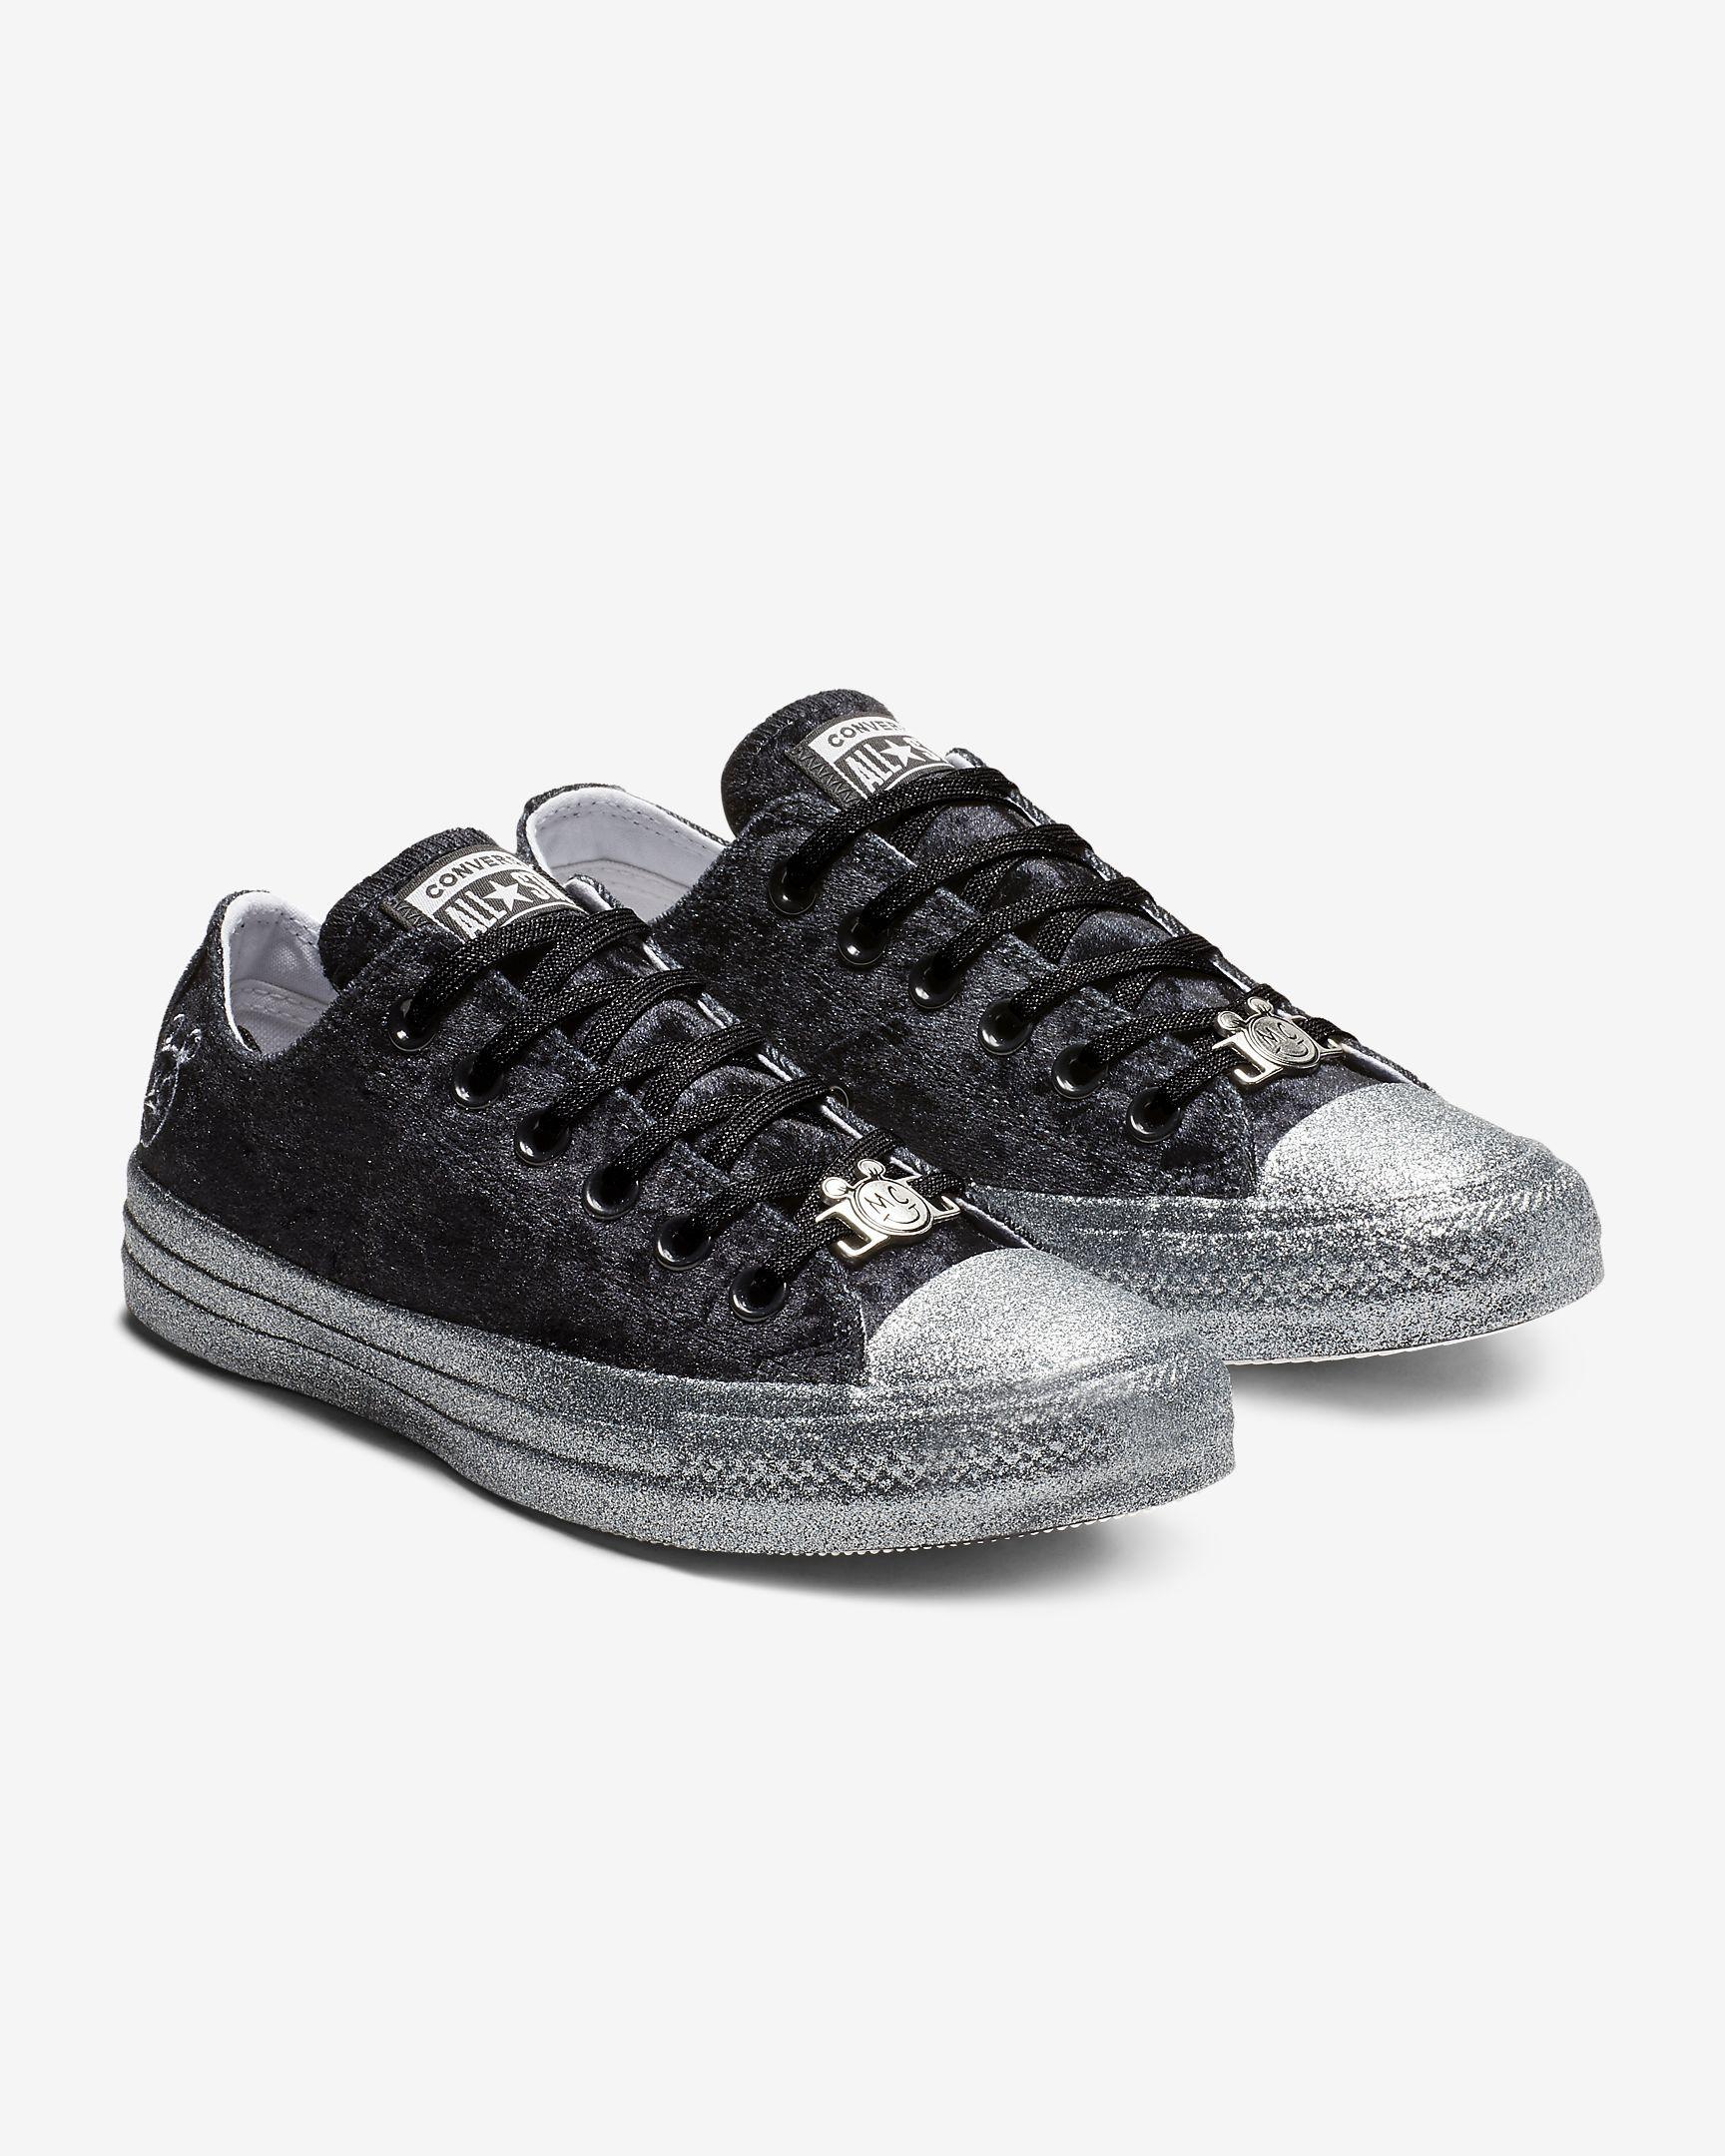 ead2180417164c Converse x Miley Cyrus Chuck Taylor All Star Velvet Low Top Women s Shoe